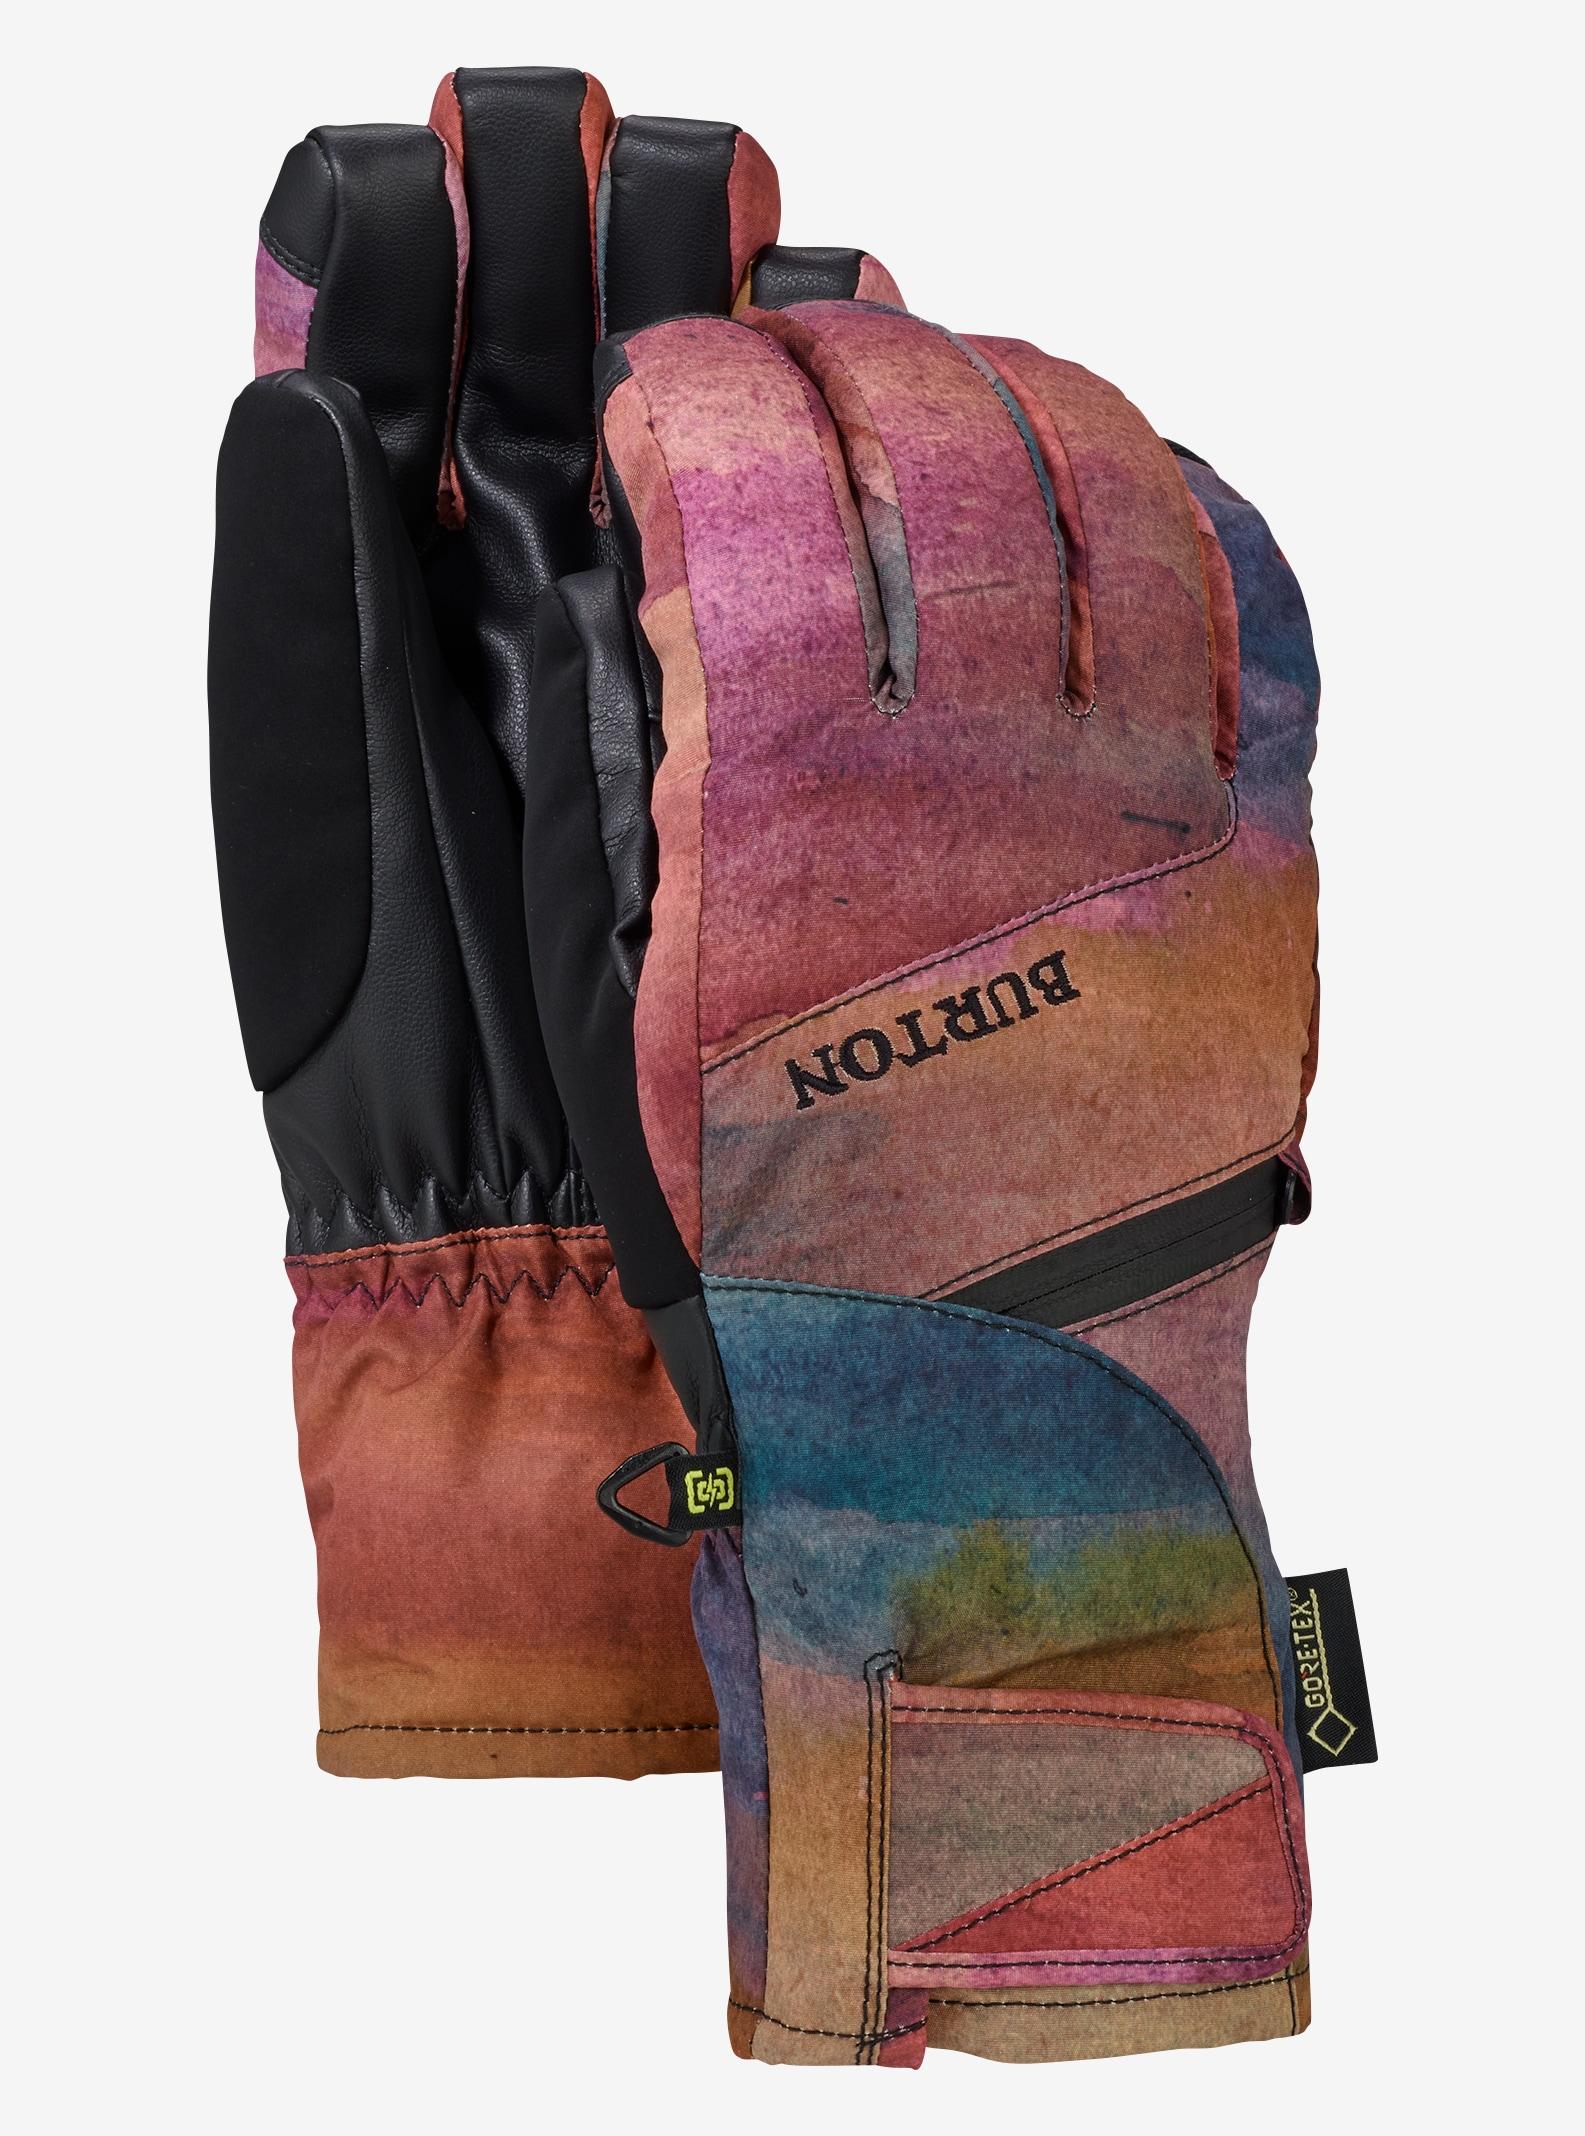 Women's Burton GORE-TEX® Under Glove shown in Sedona